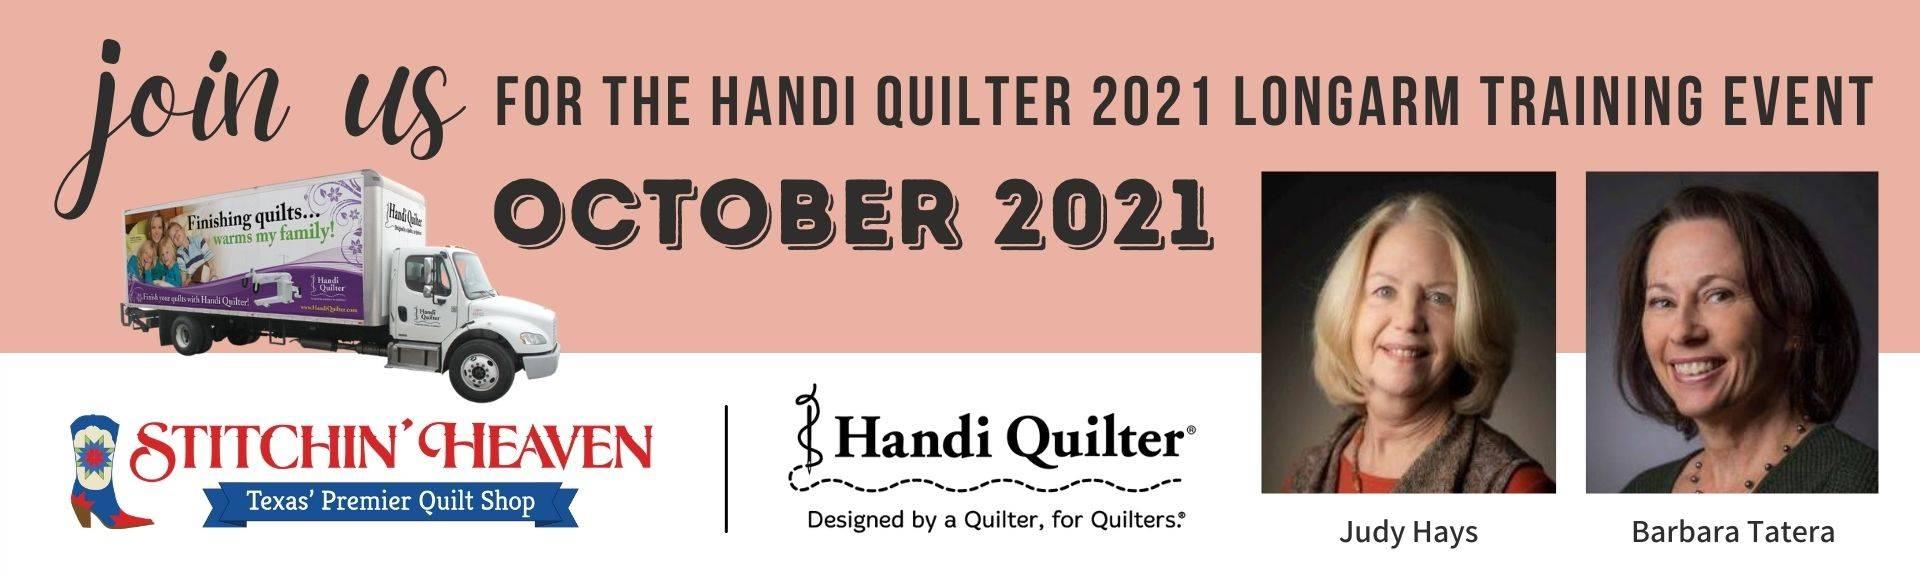 Handi Quilter 2021 Longarm Training Event at Stitchin' Heaven, Quitman, TX. - October 2021